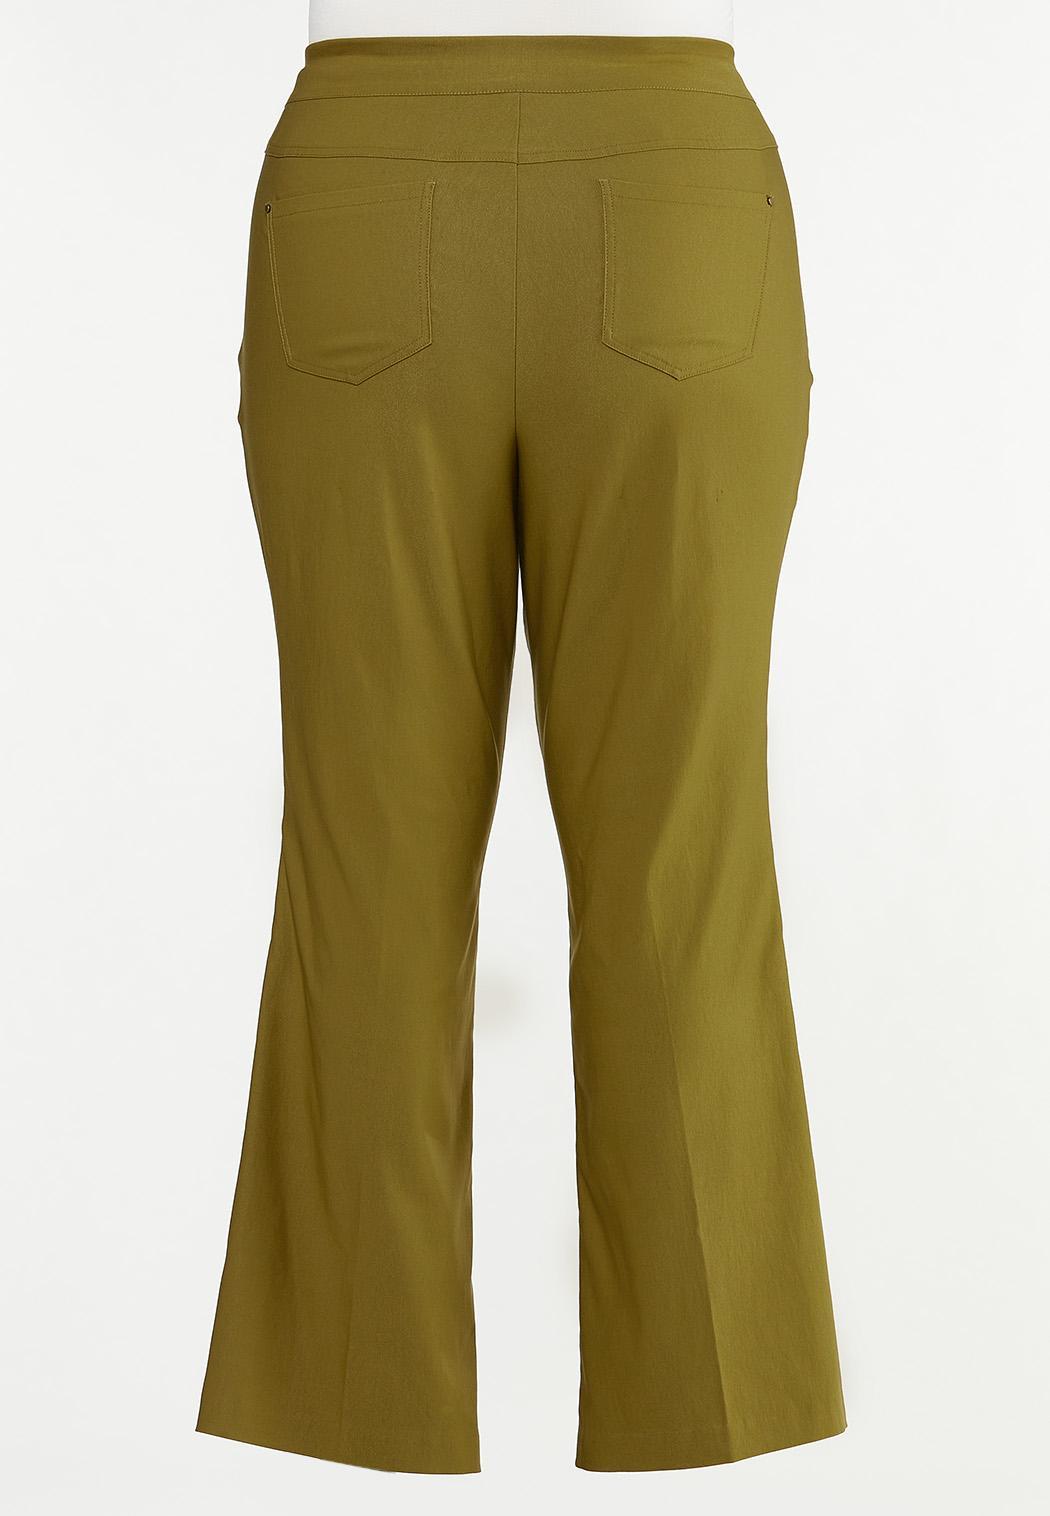 Plus Size Solid Bengaline Flare Pants (Item #44622666)